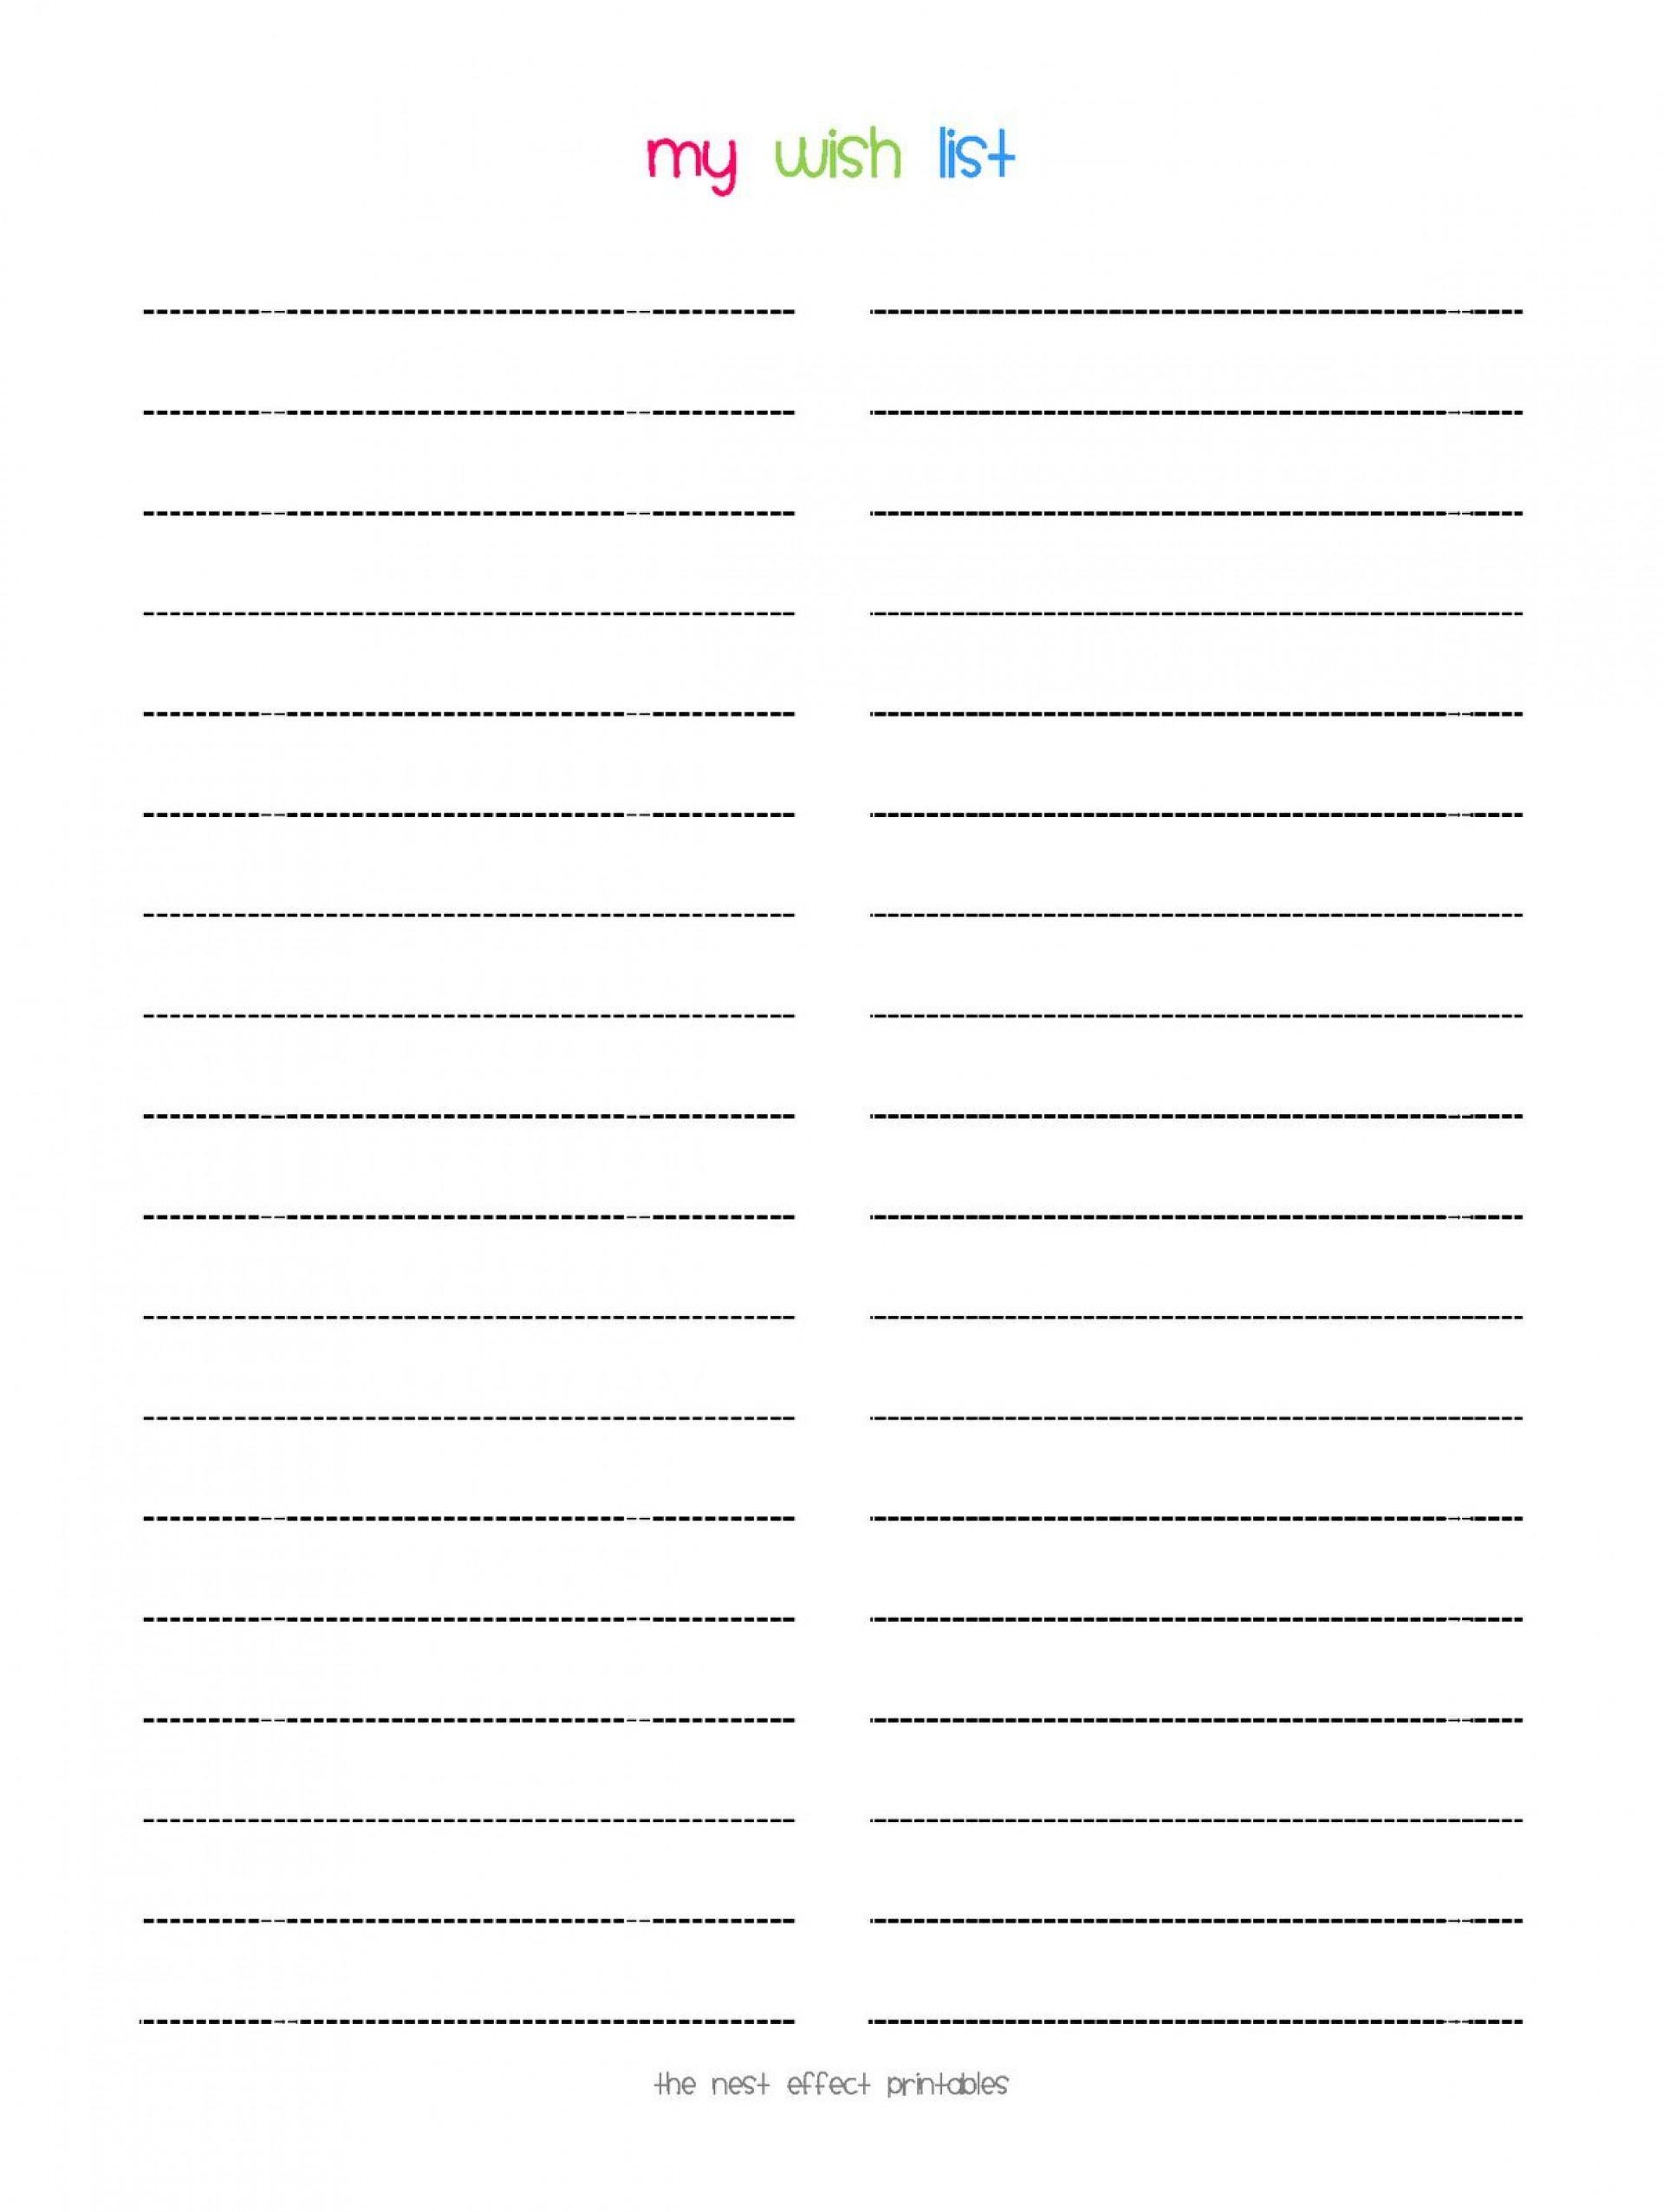 008 Stunning Printable Wish List Template Idea  Cute Christma Free Holiday1920